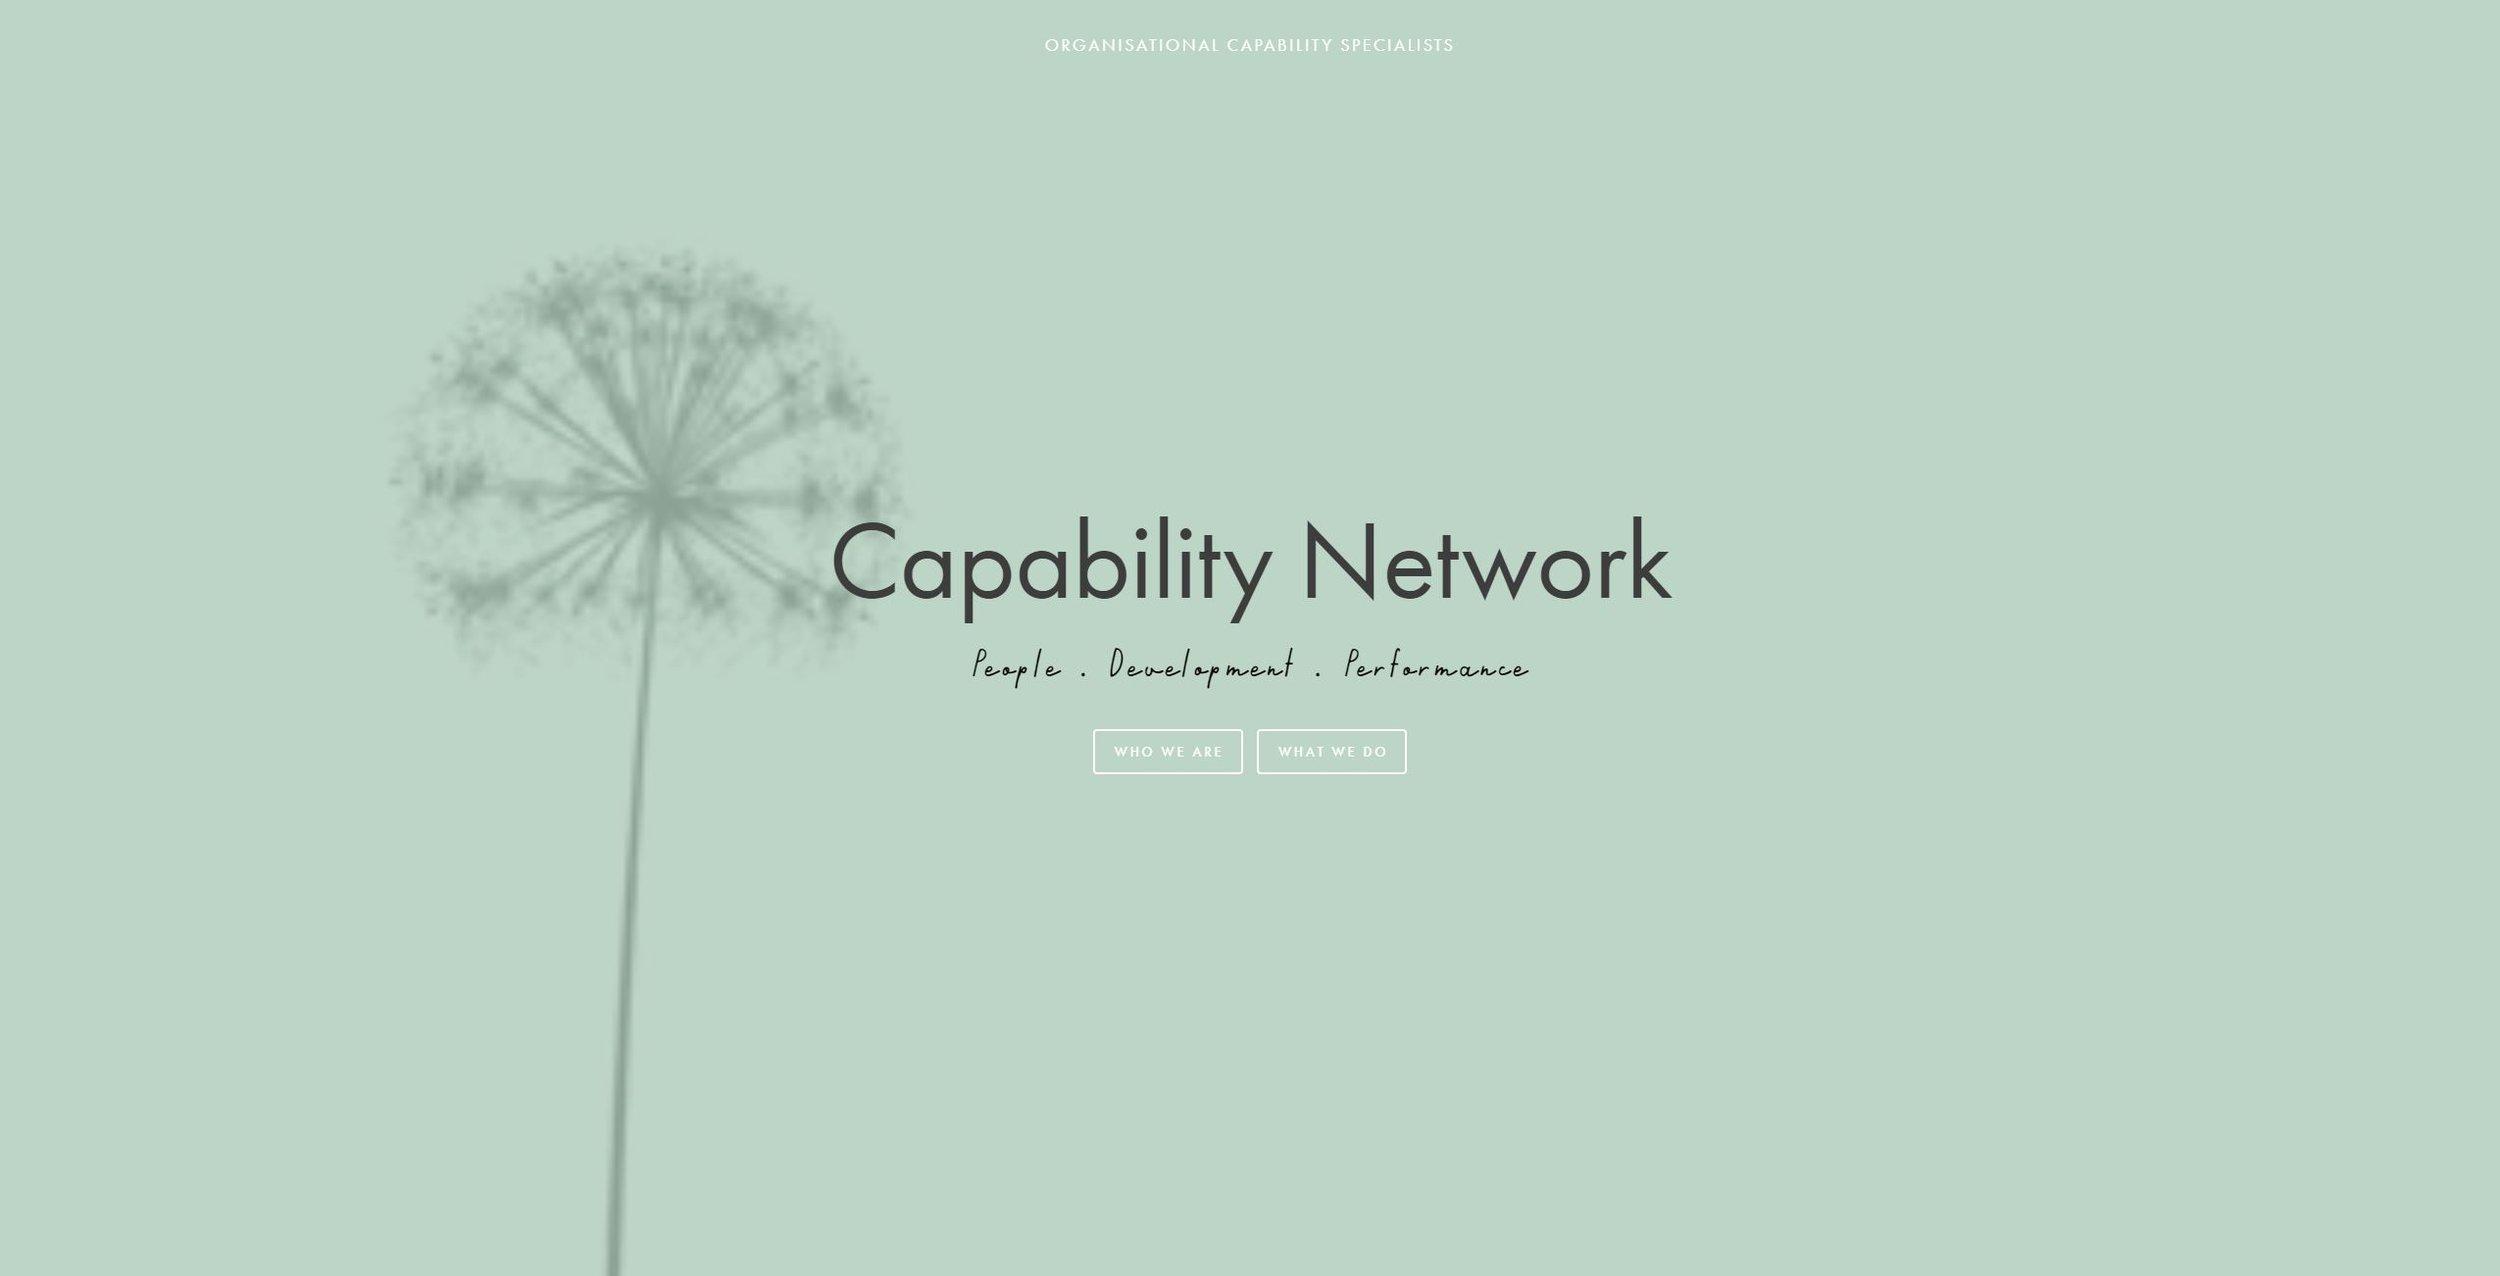 Capability Network